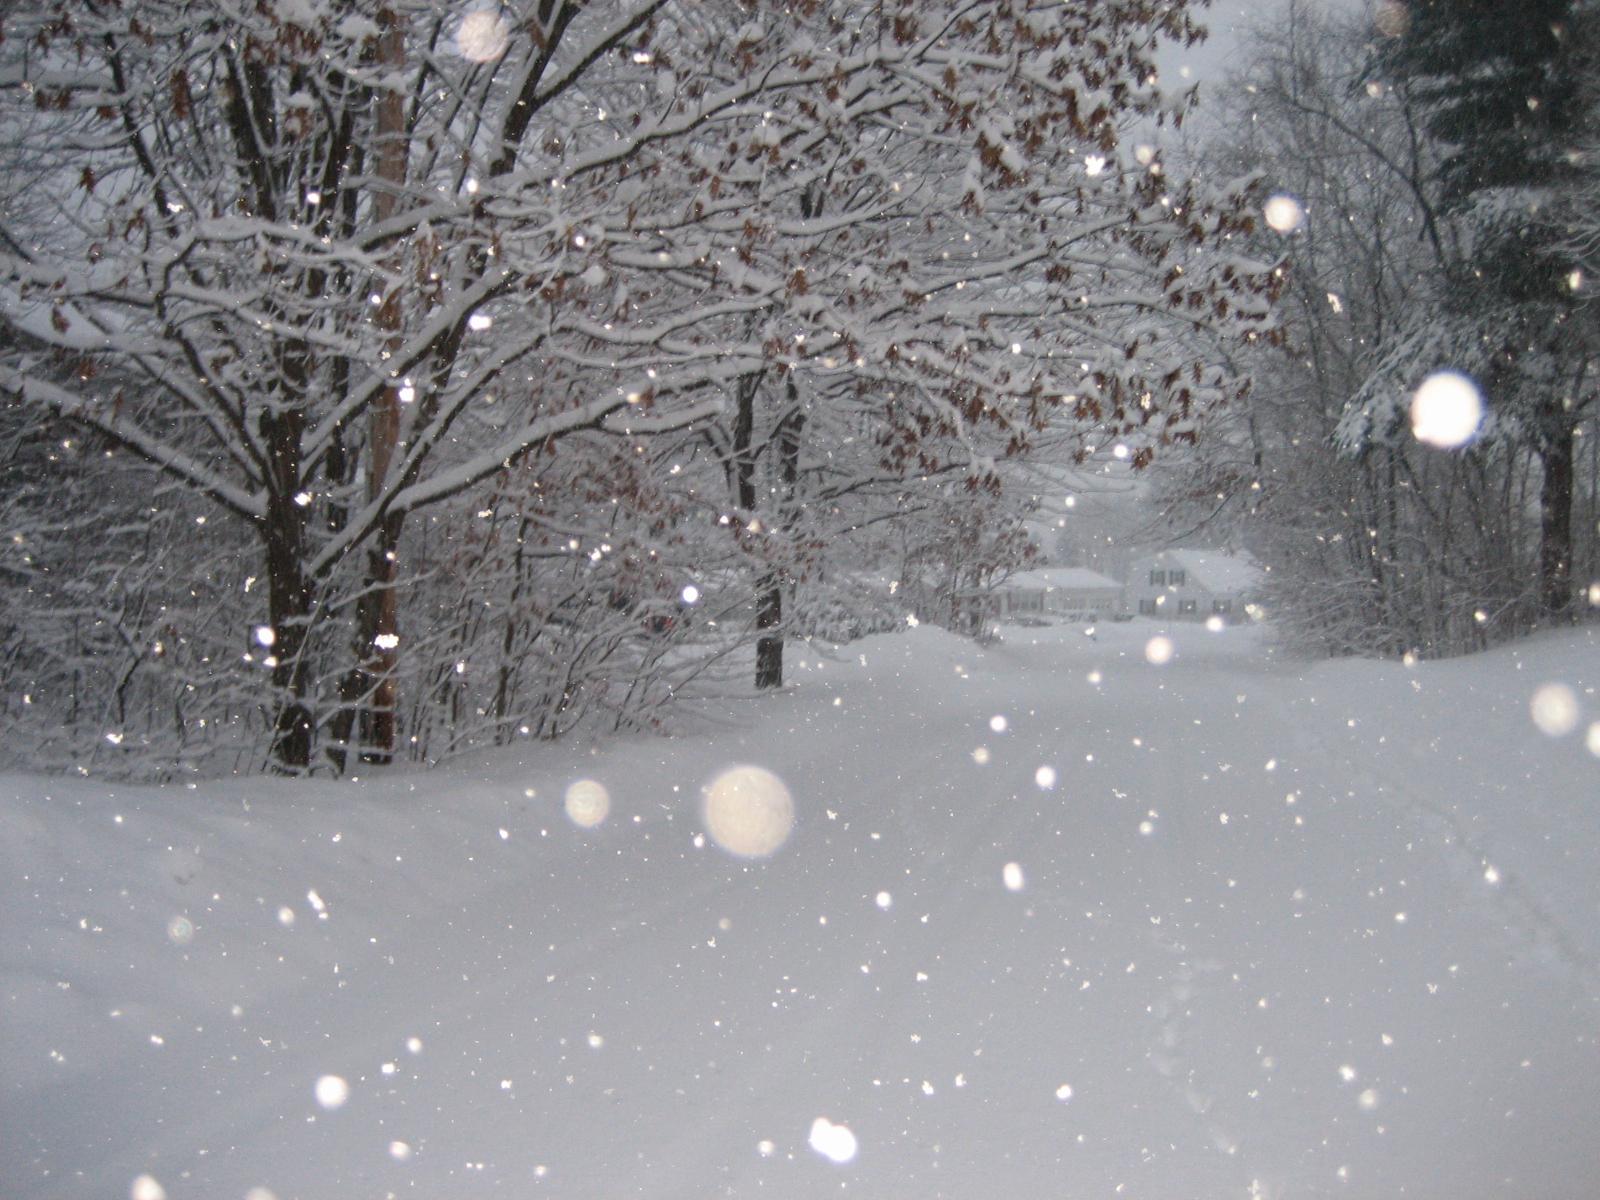 preparing_for_winter_weather.jpeg